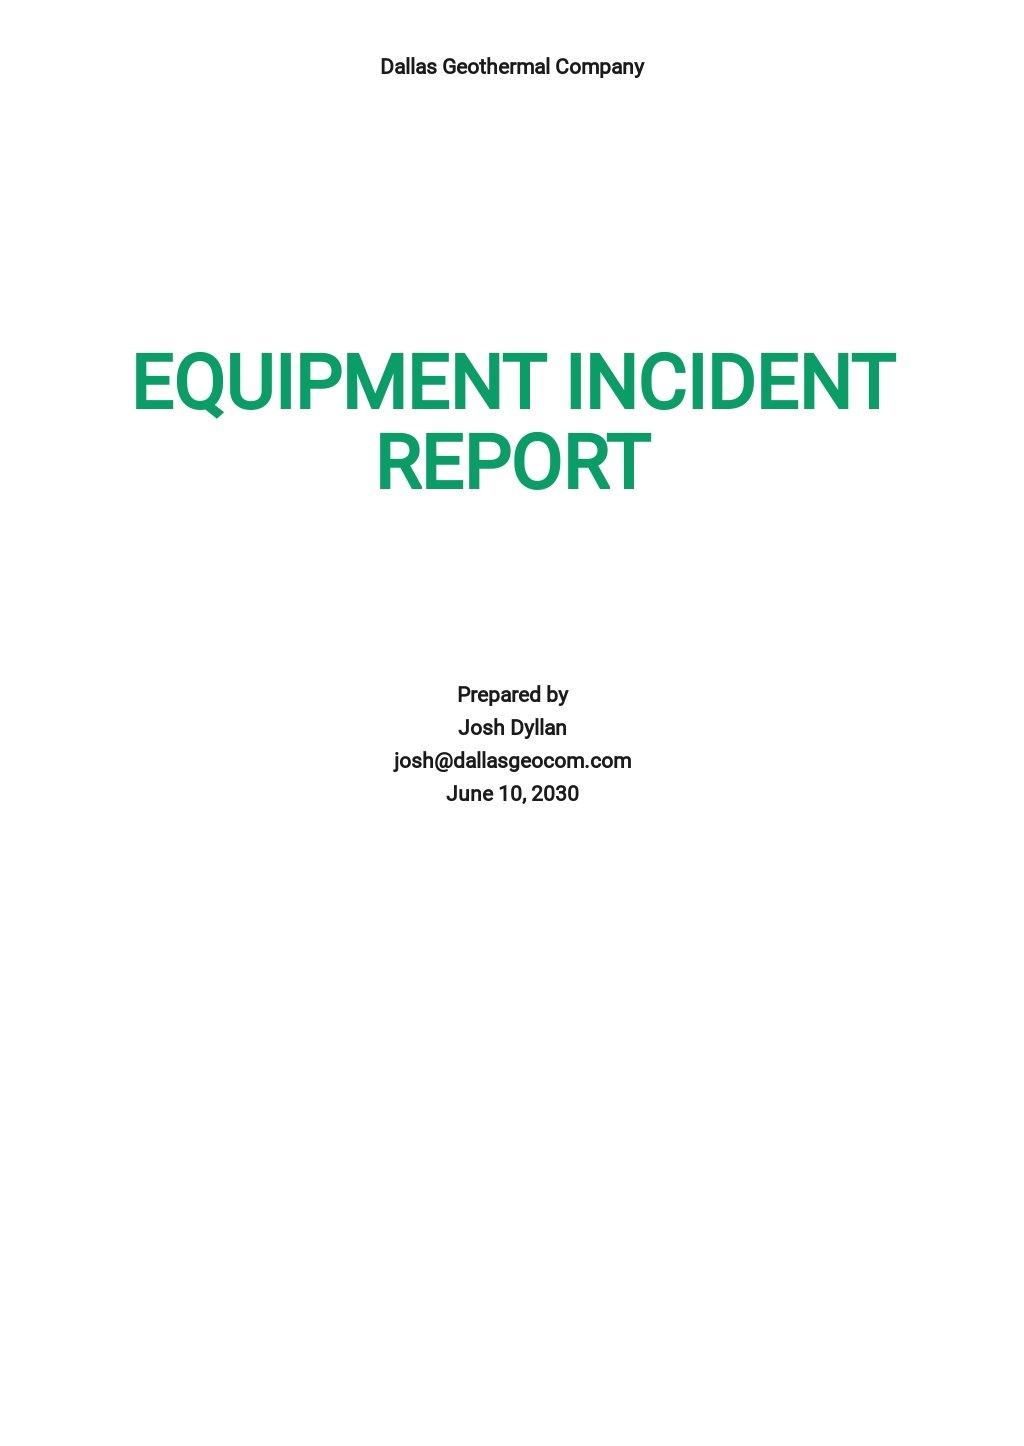 Free Equipment Incident Report Template.jpe